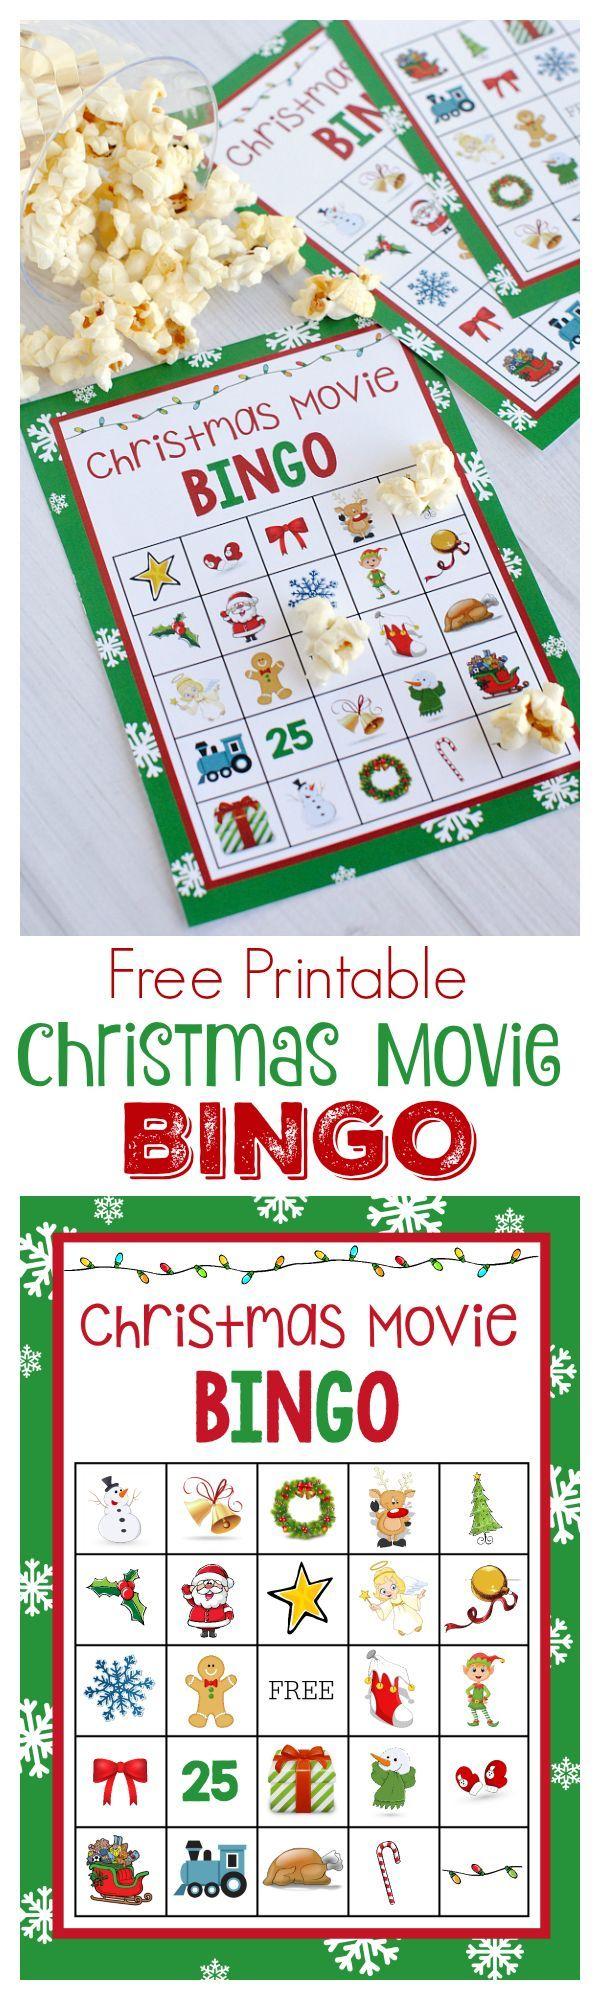 Free Christmas Movie Bingo Printable Game! See 20 more free holiday printables on www.prettymyparty.com.